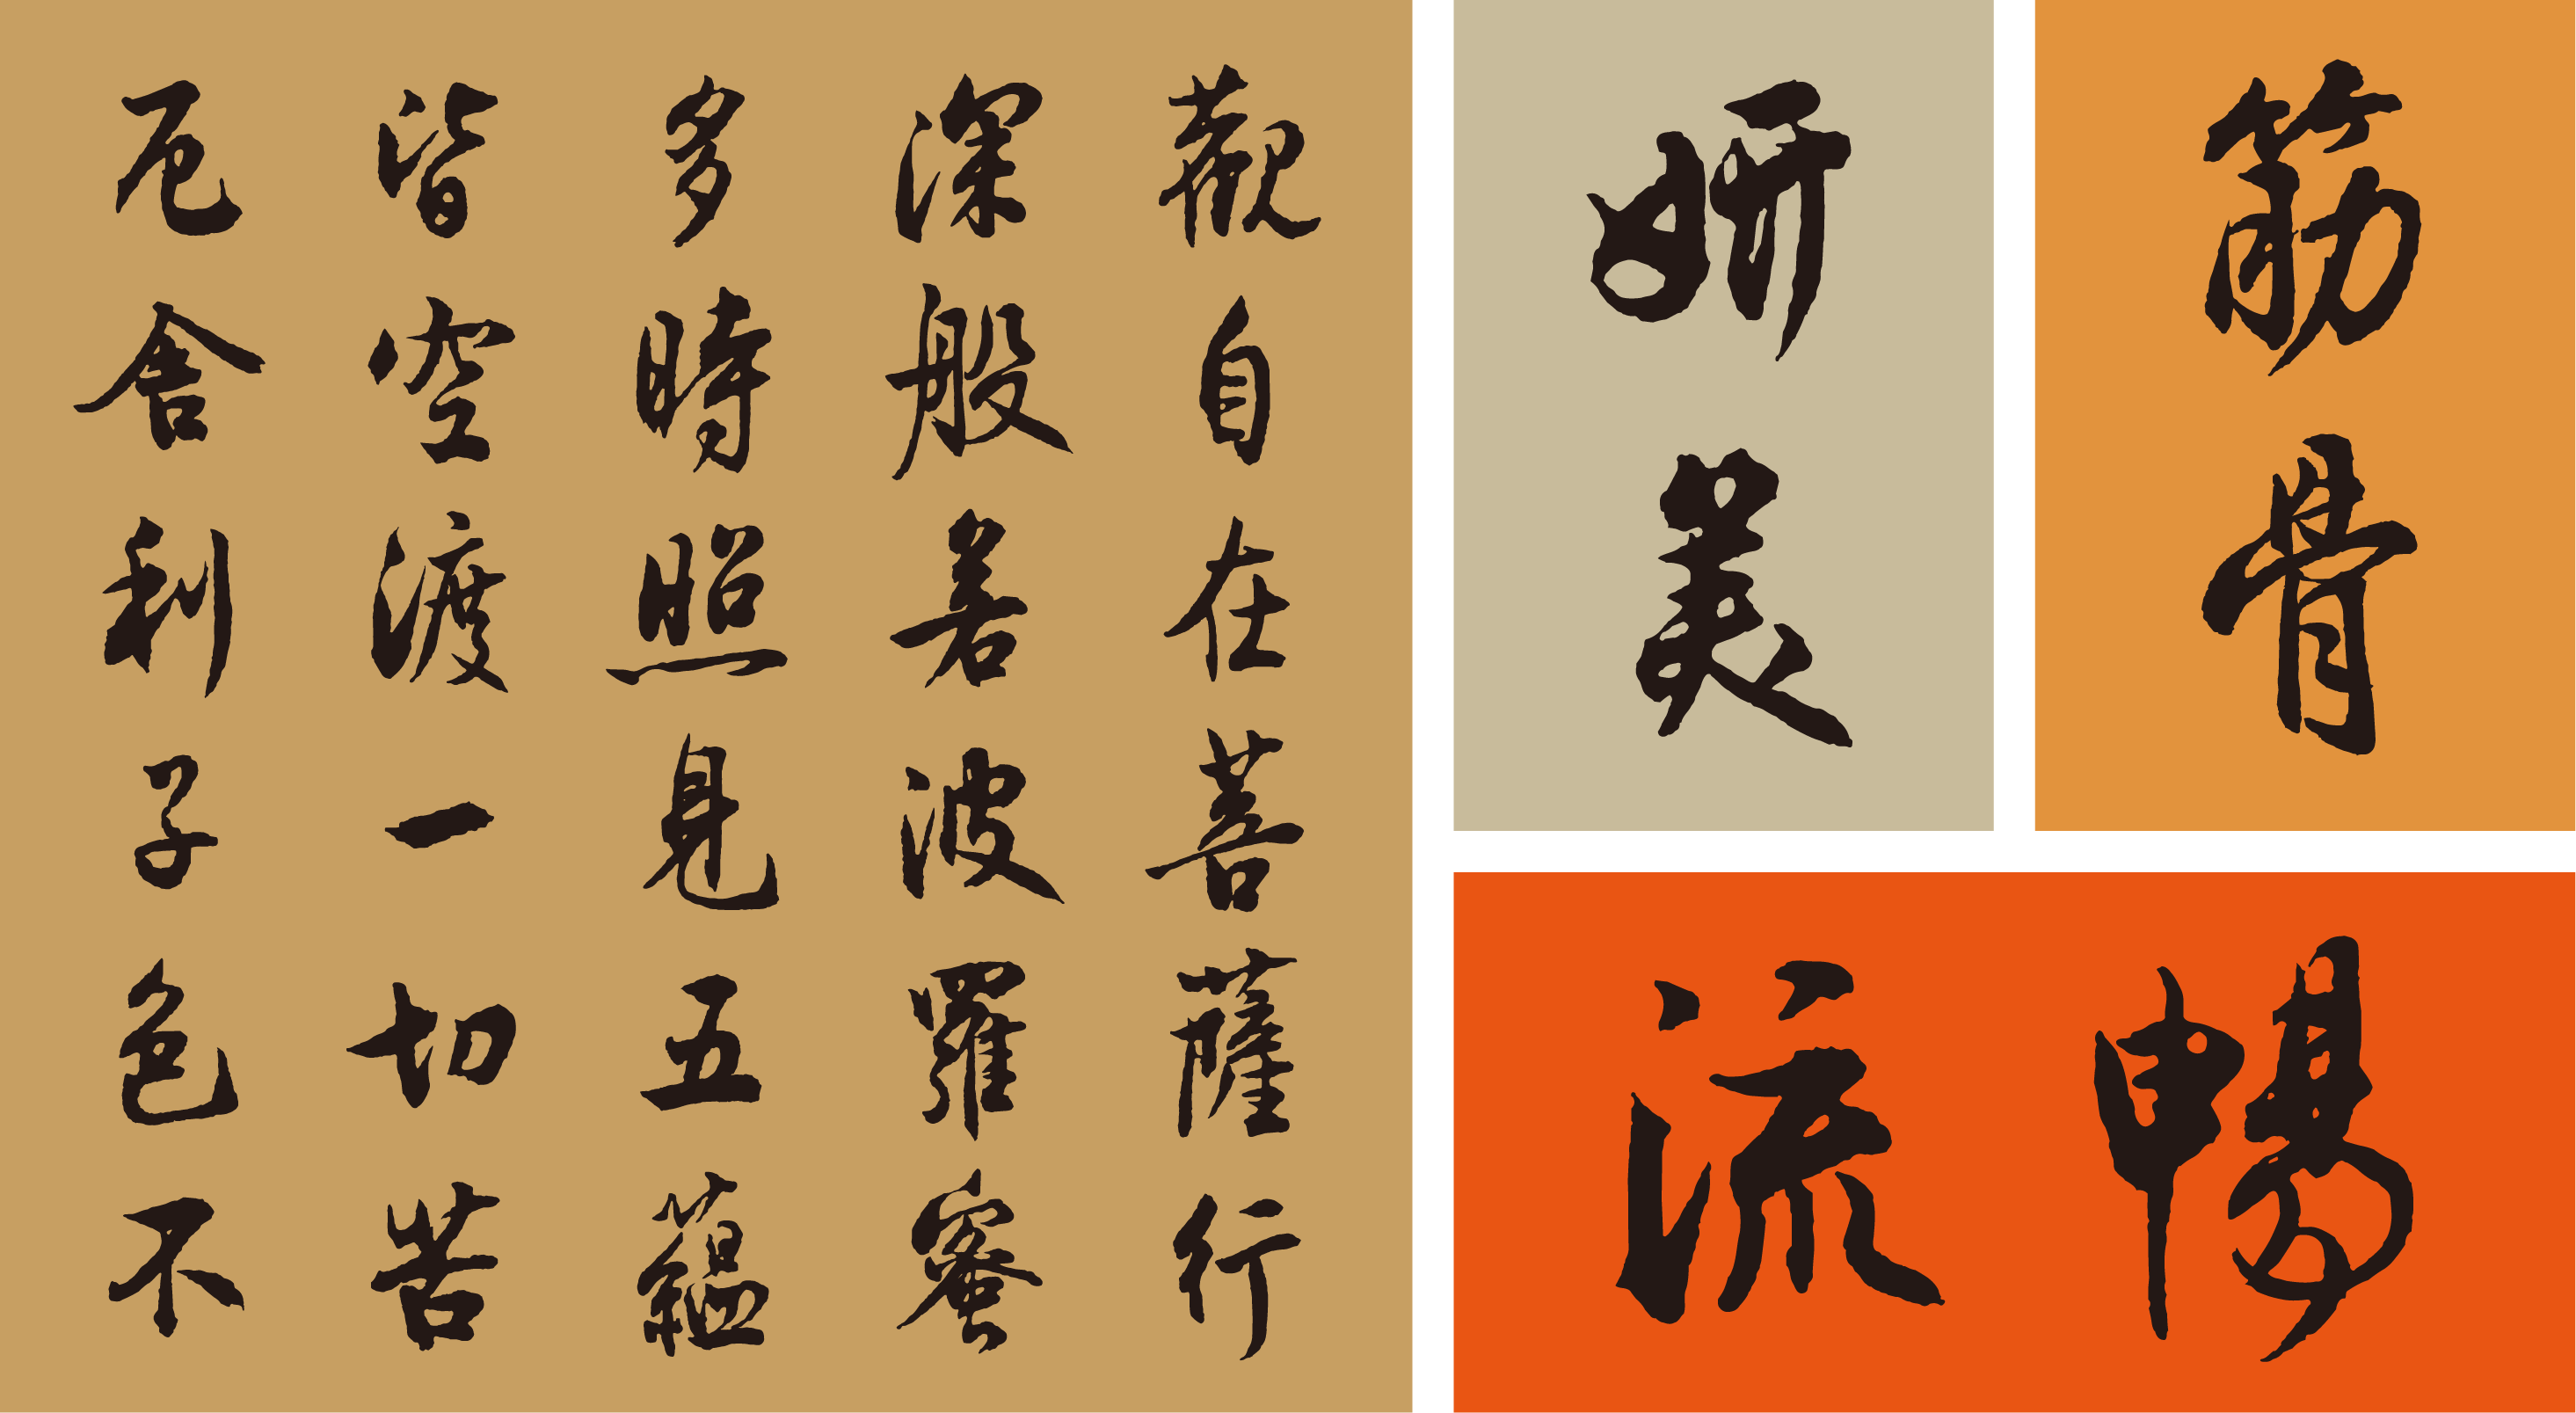 https://ft-bk1.oss-cn-zhangjiakou.aliyuncs.com/Public/Uploads/img/n_content_20201210174813_9629.png